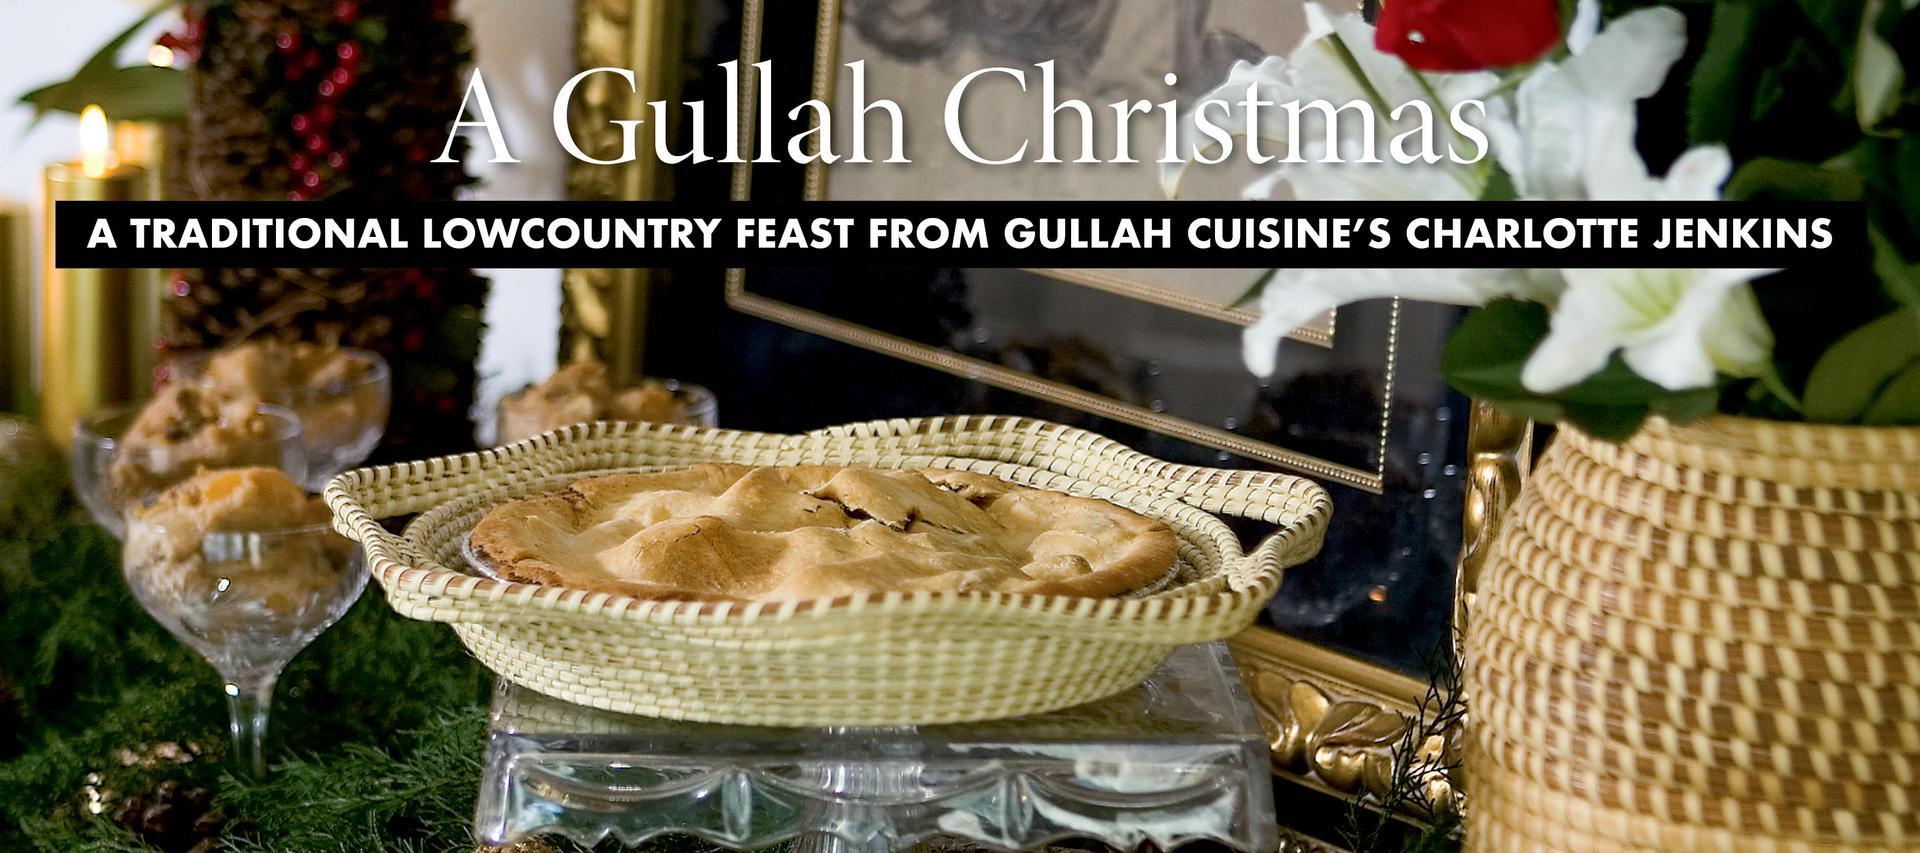 Recipes - A Gullah Christmas